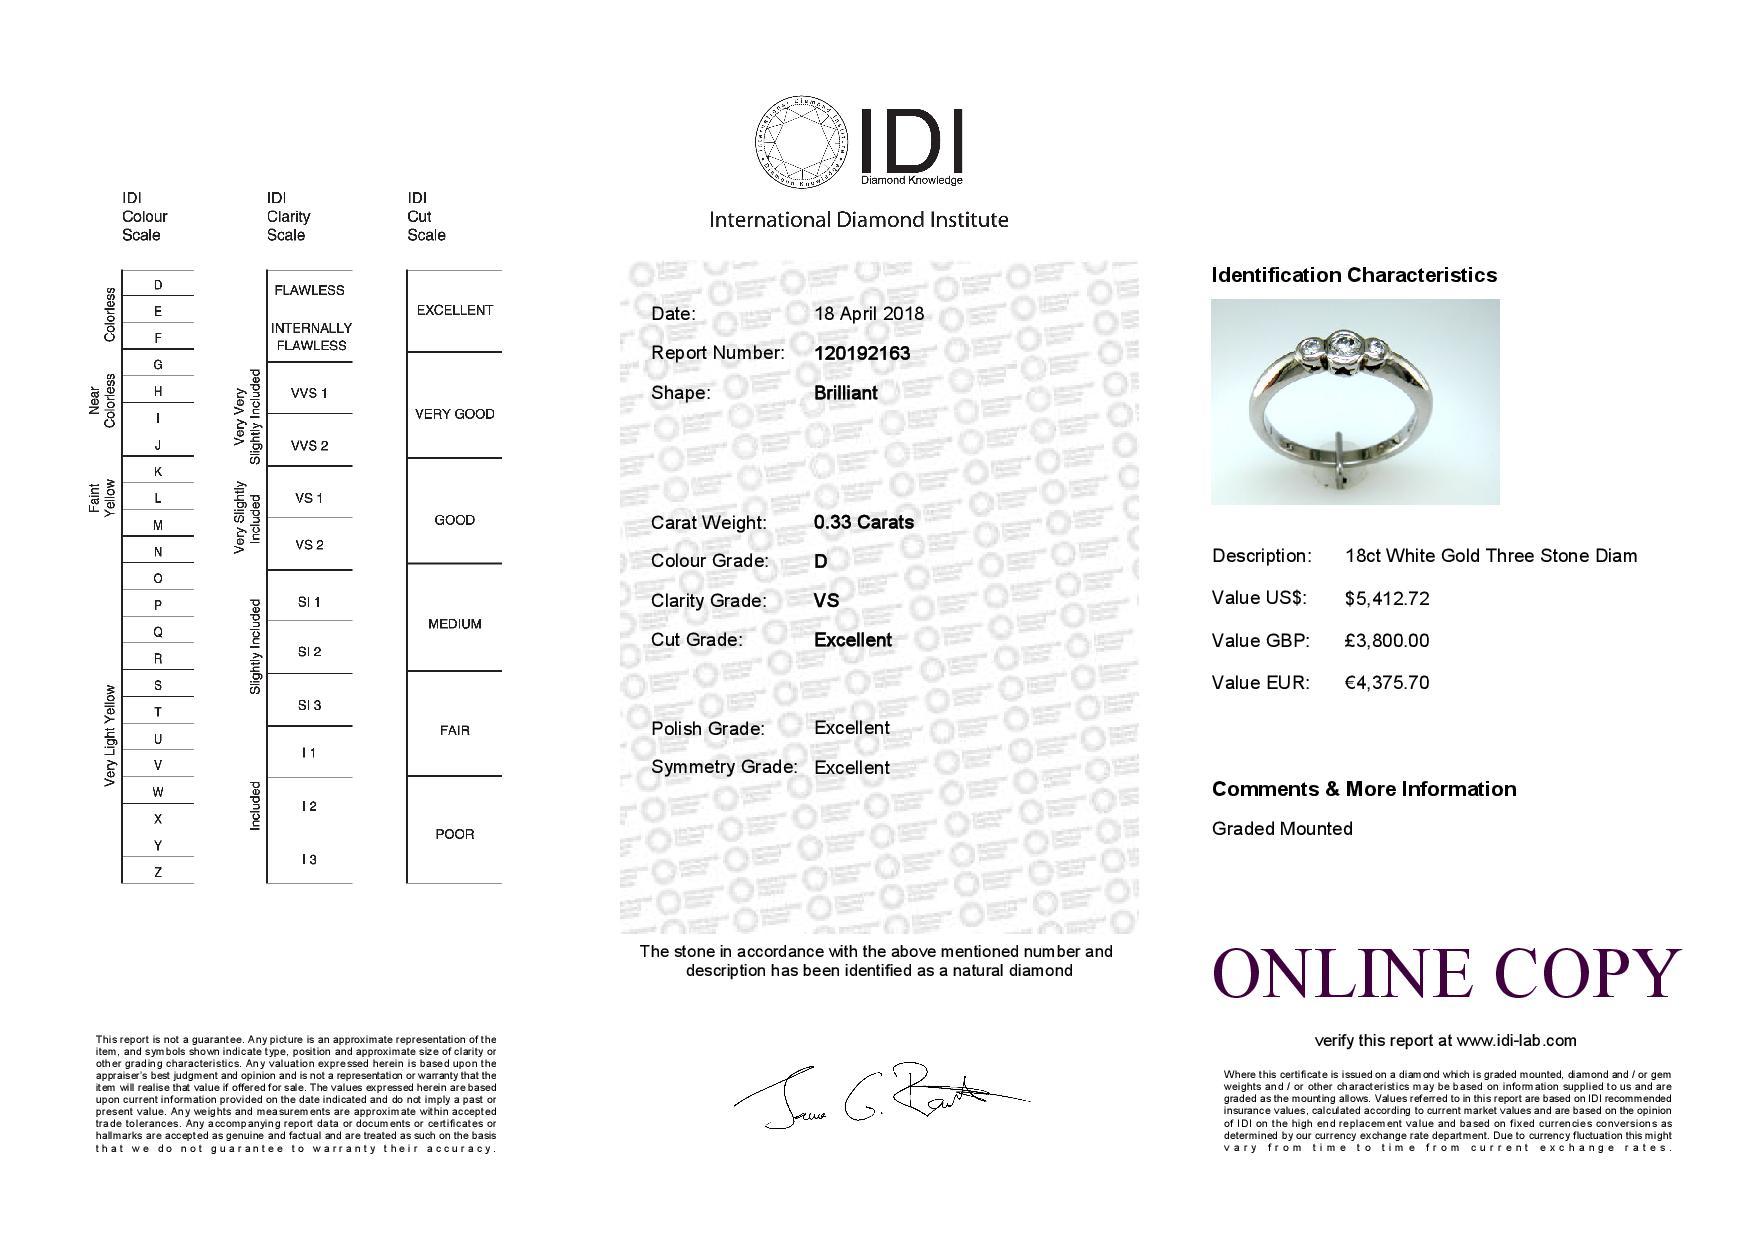 Lot 33 - 18ct Three Stone Rub Over Set Diamond Ring 0.33 Carats